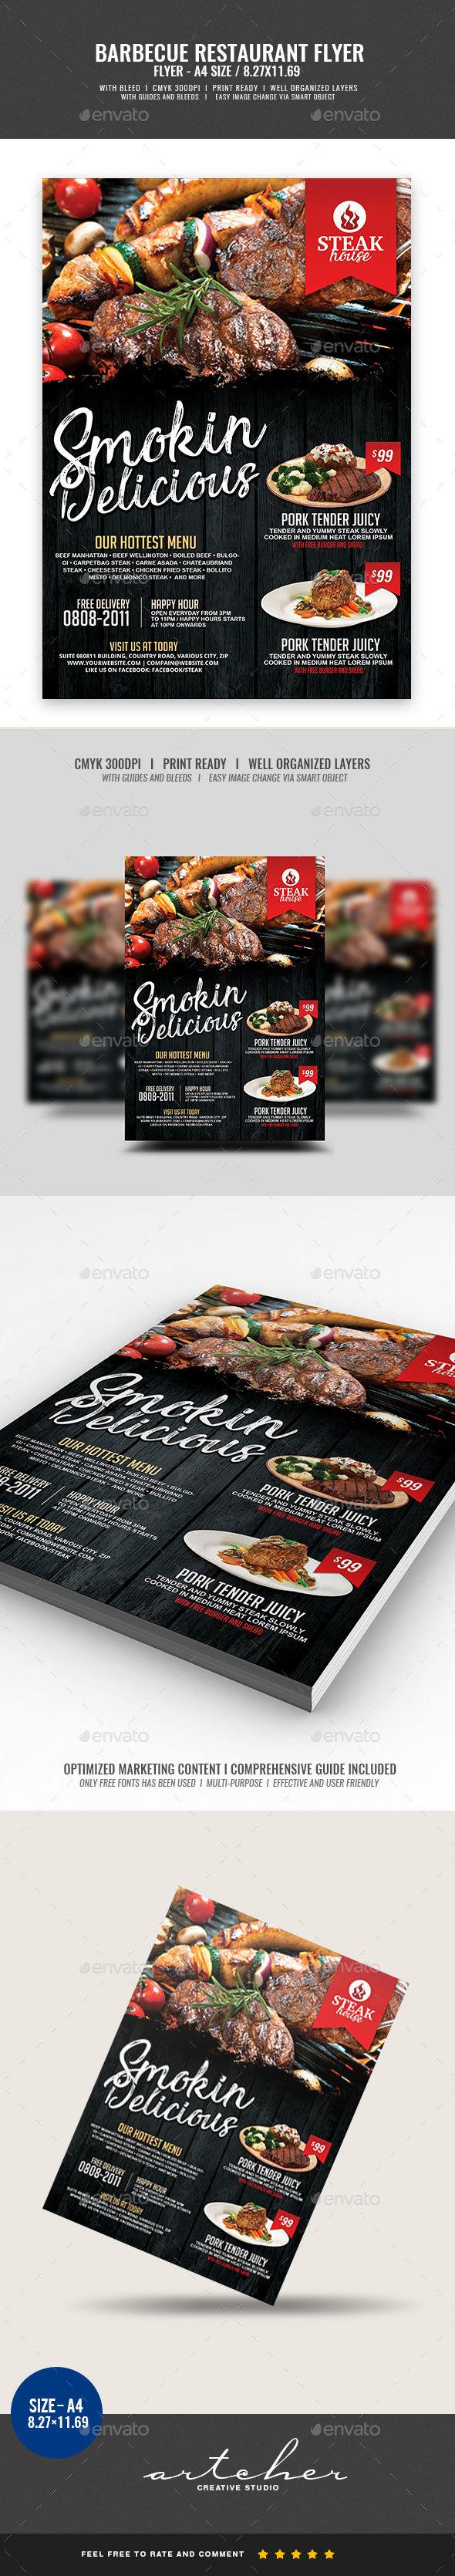 Barbecue Steakhouse Restaurant Flyer - Restaurant Flyers